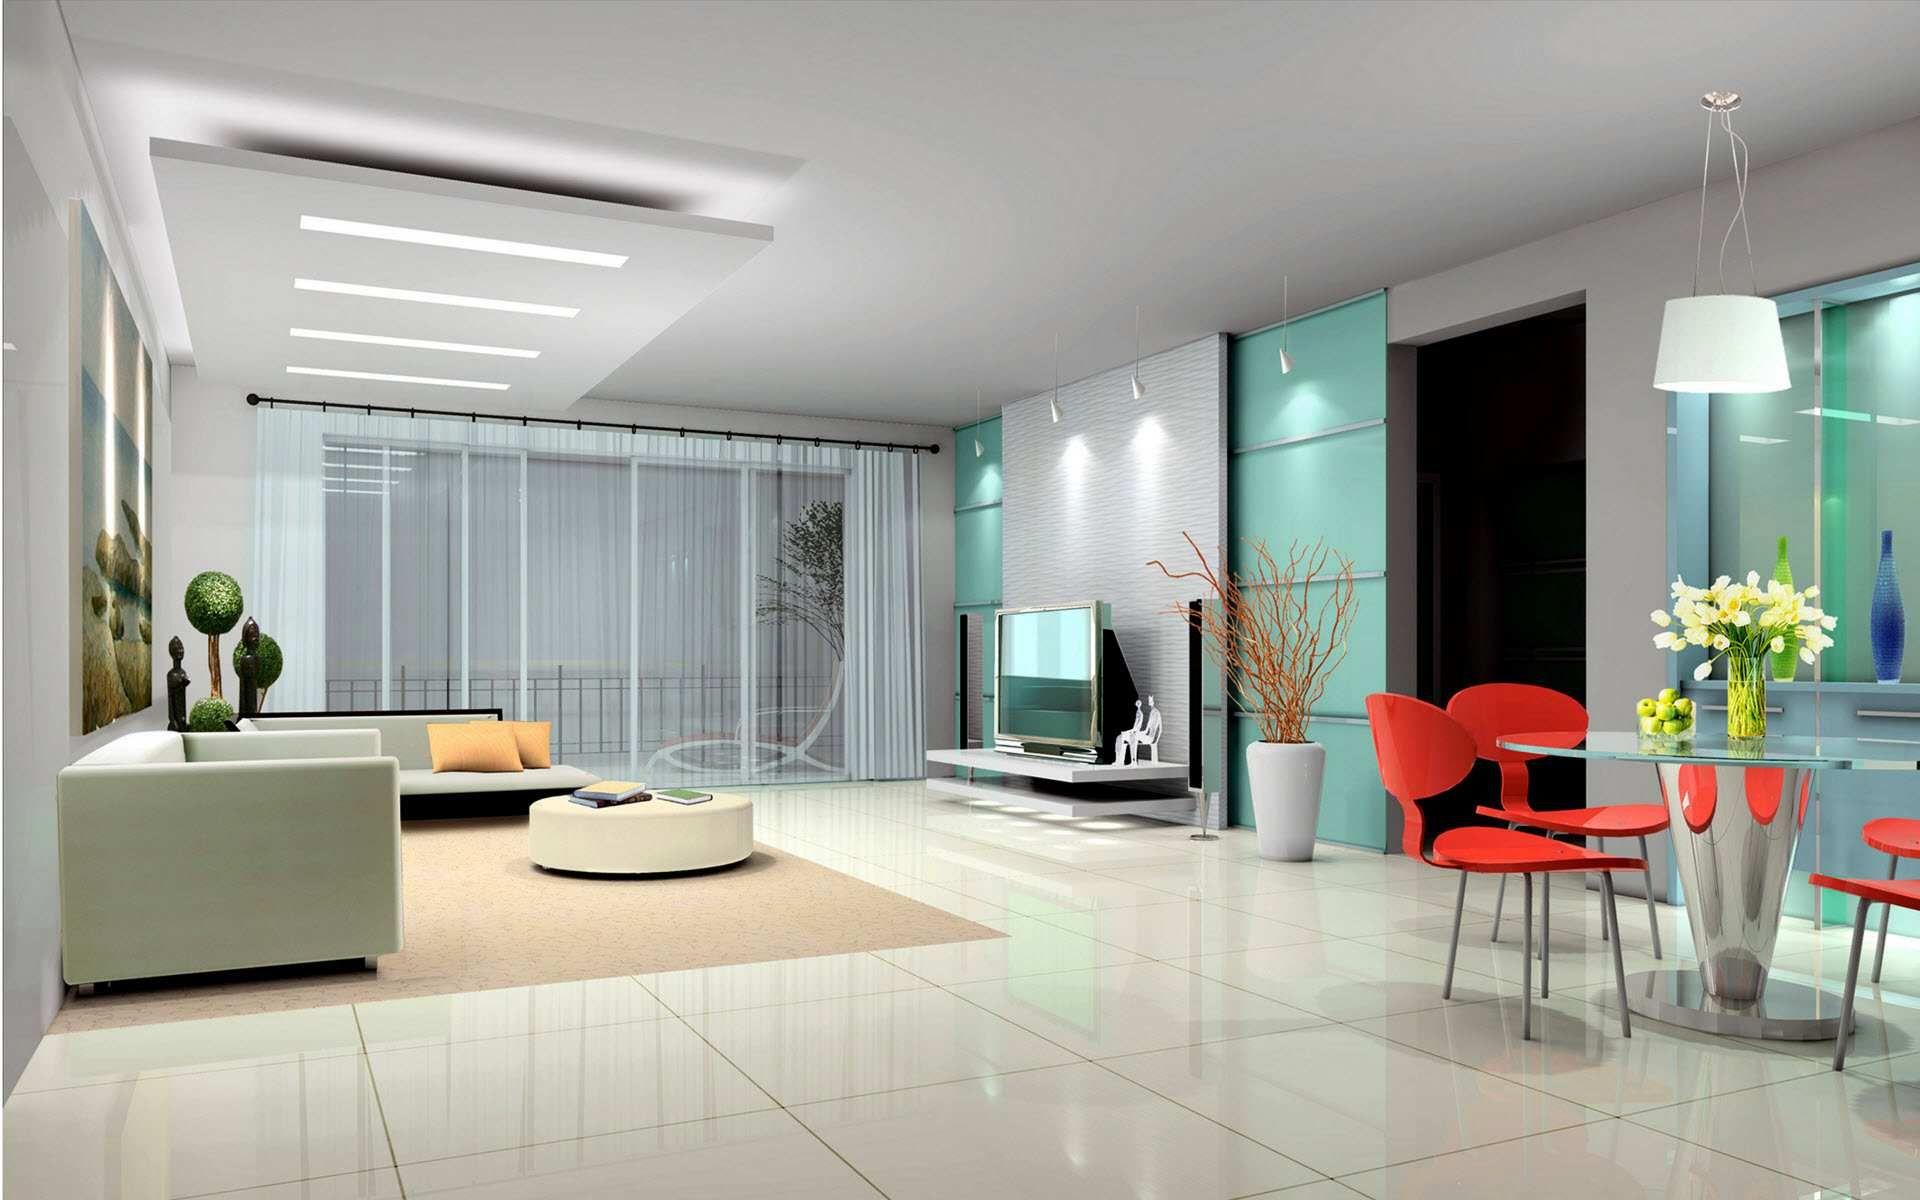 Home Design Inspiration #homeworlddesign #interiordesign #interior #interiors #house #home #bedrooms #design #architecture #decor #homedecor  #kitchen #livingroom #bedroom #batroom #diningroom #garden #Landscape